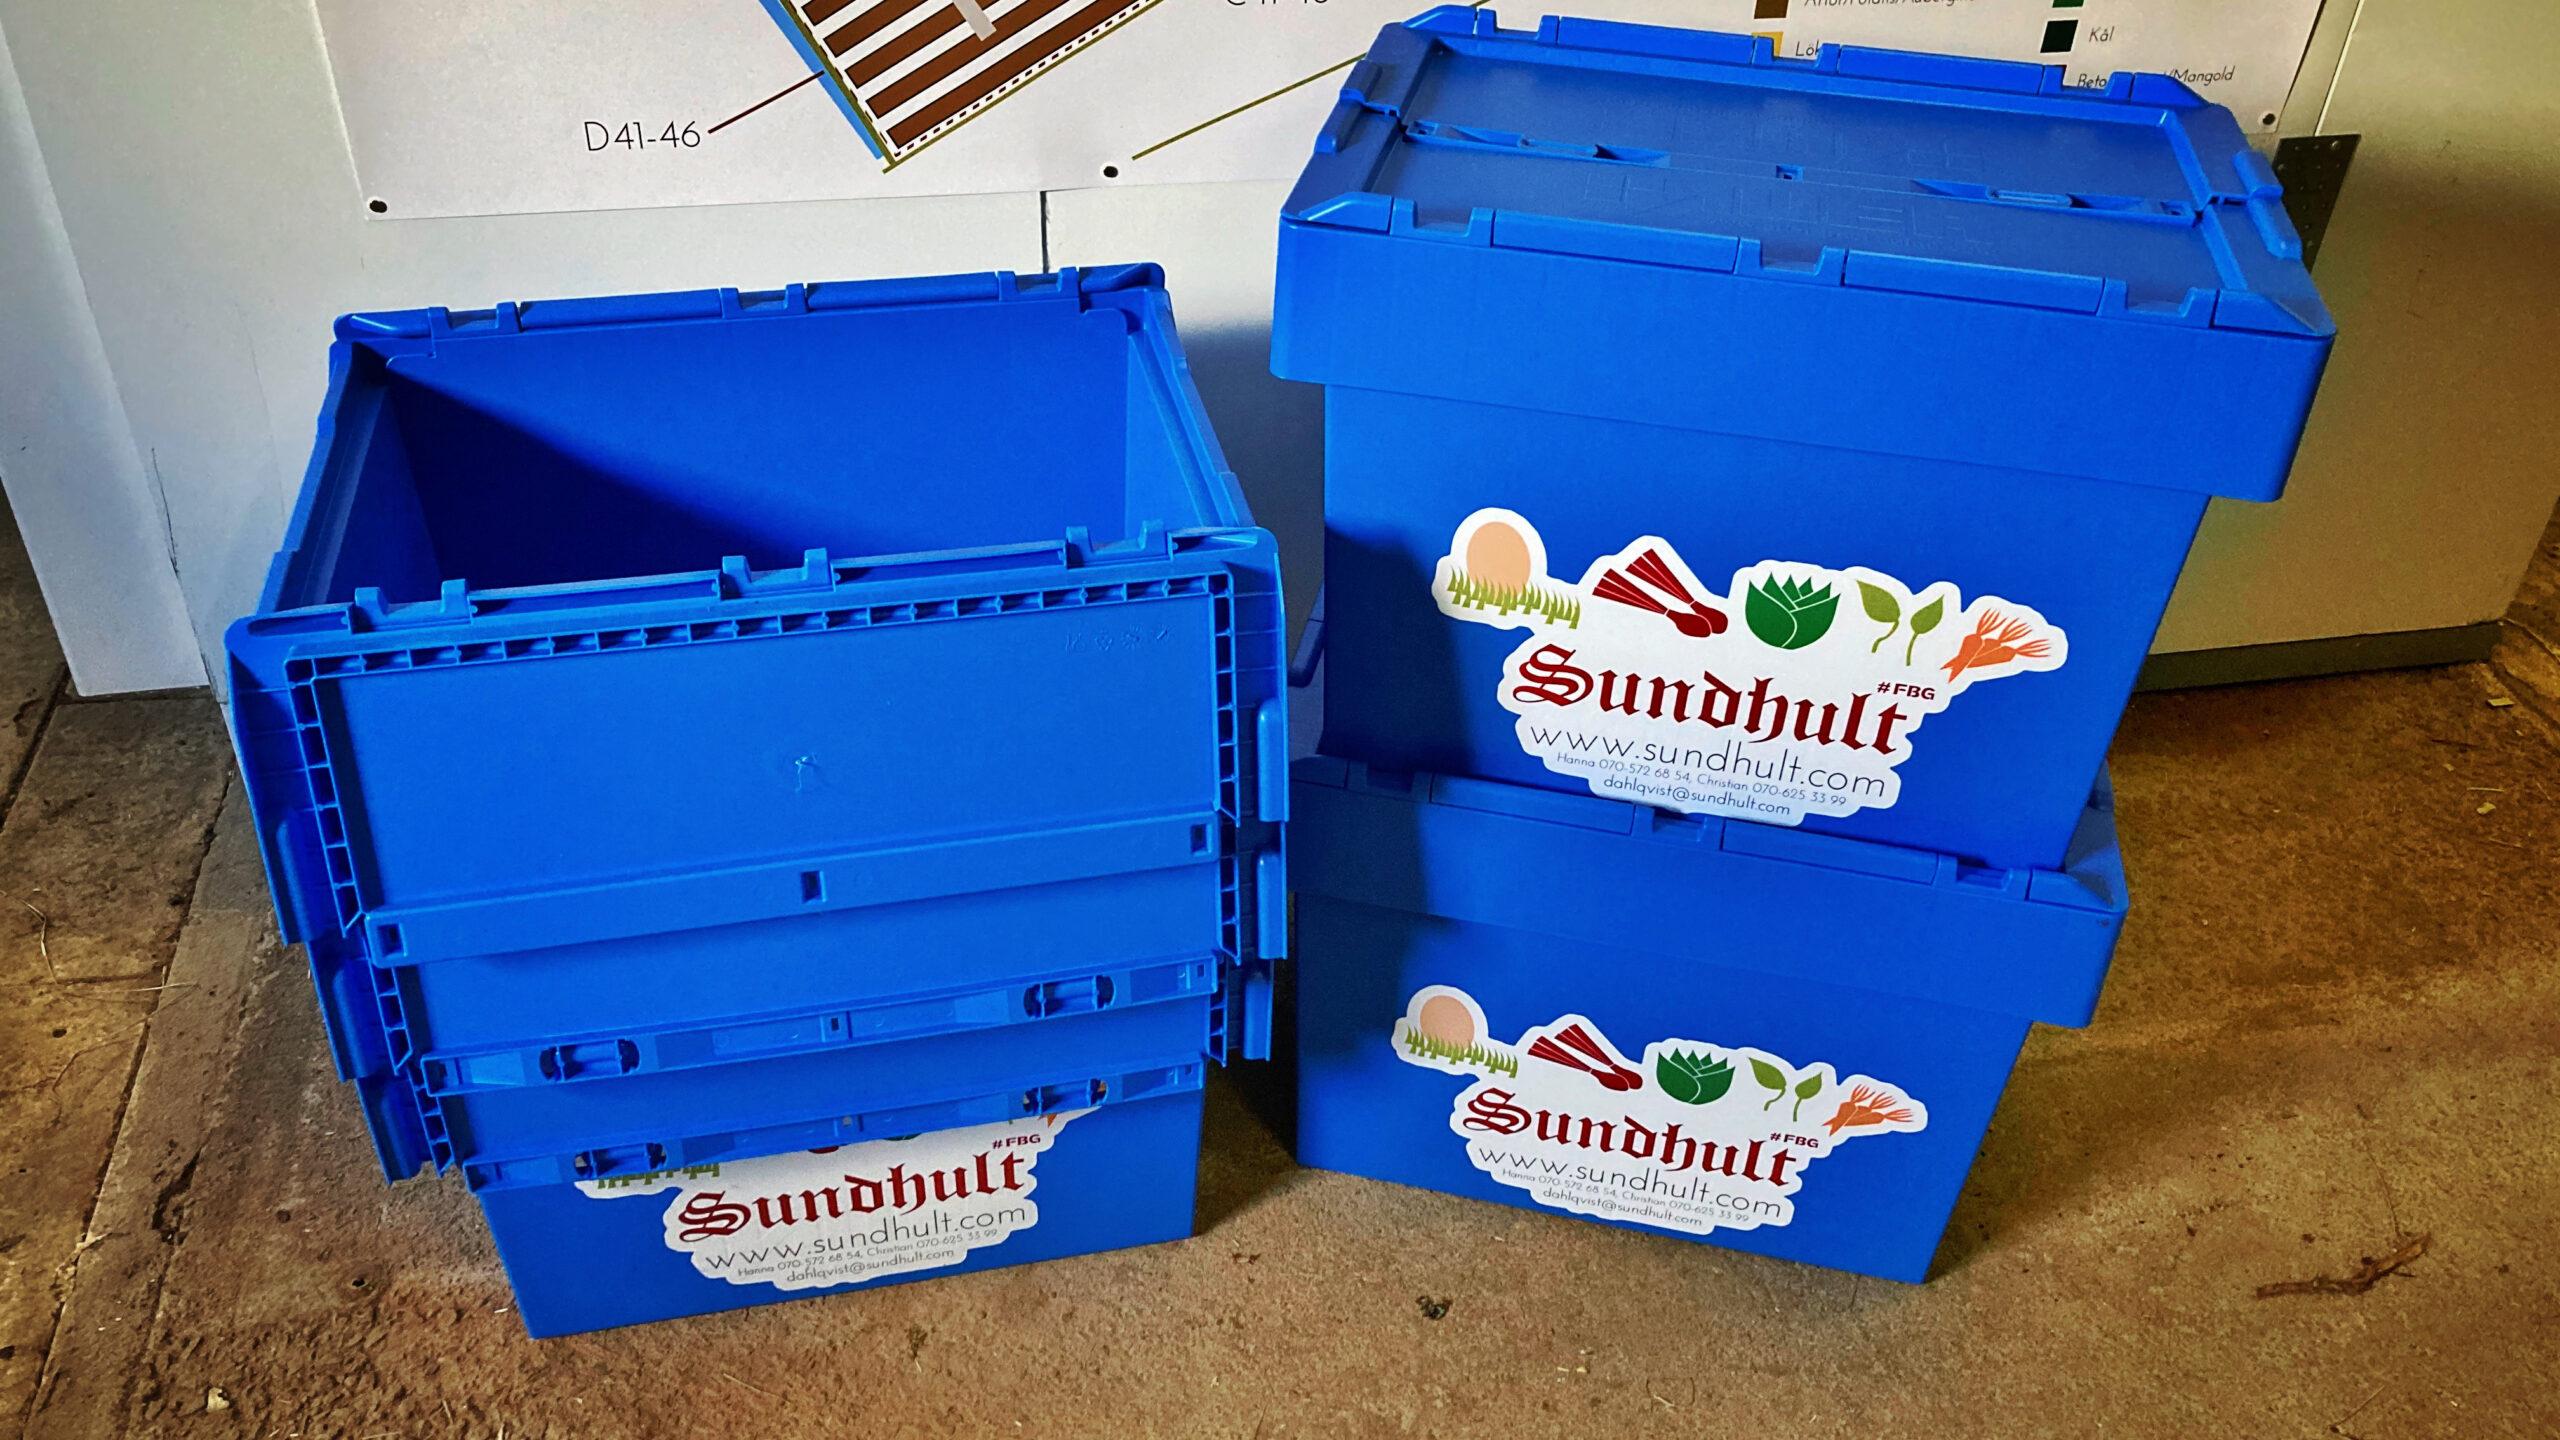 Auer-lådor som vi köpte av Rigedale Farm